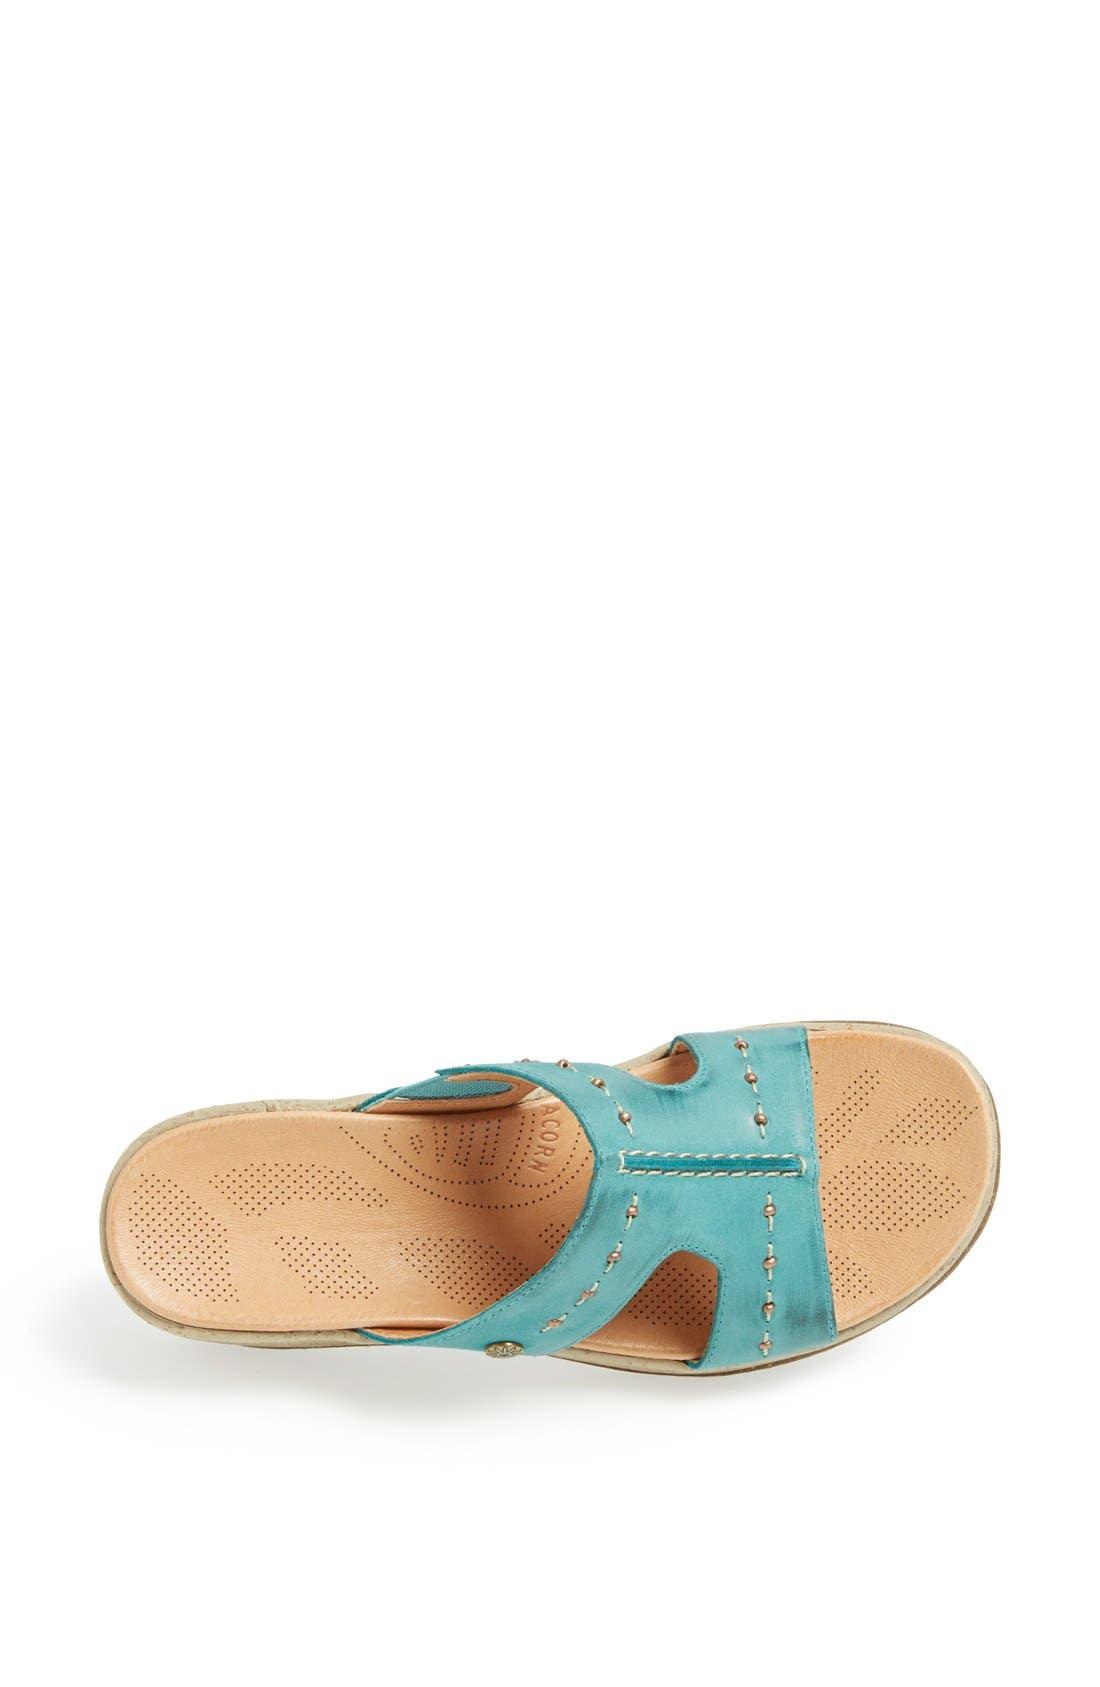 Alternate Image 3  - Acorn 'Vista' Wedge Sandal